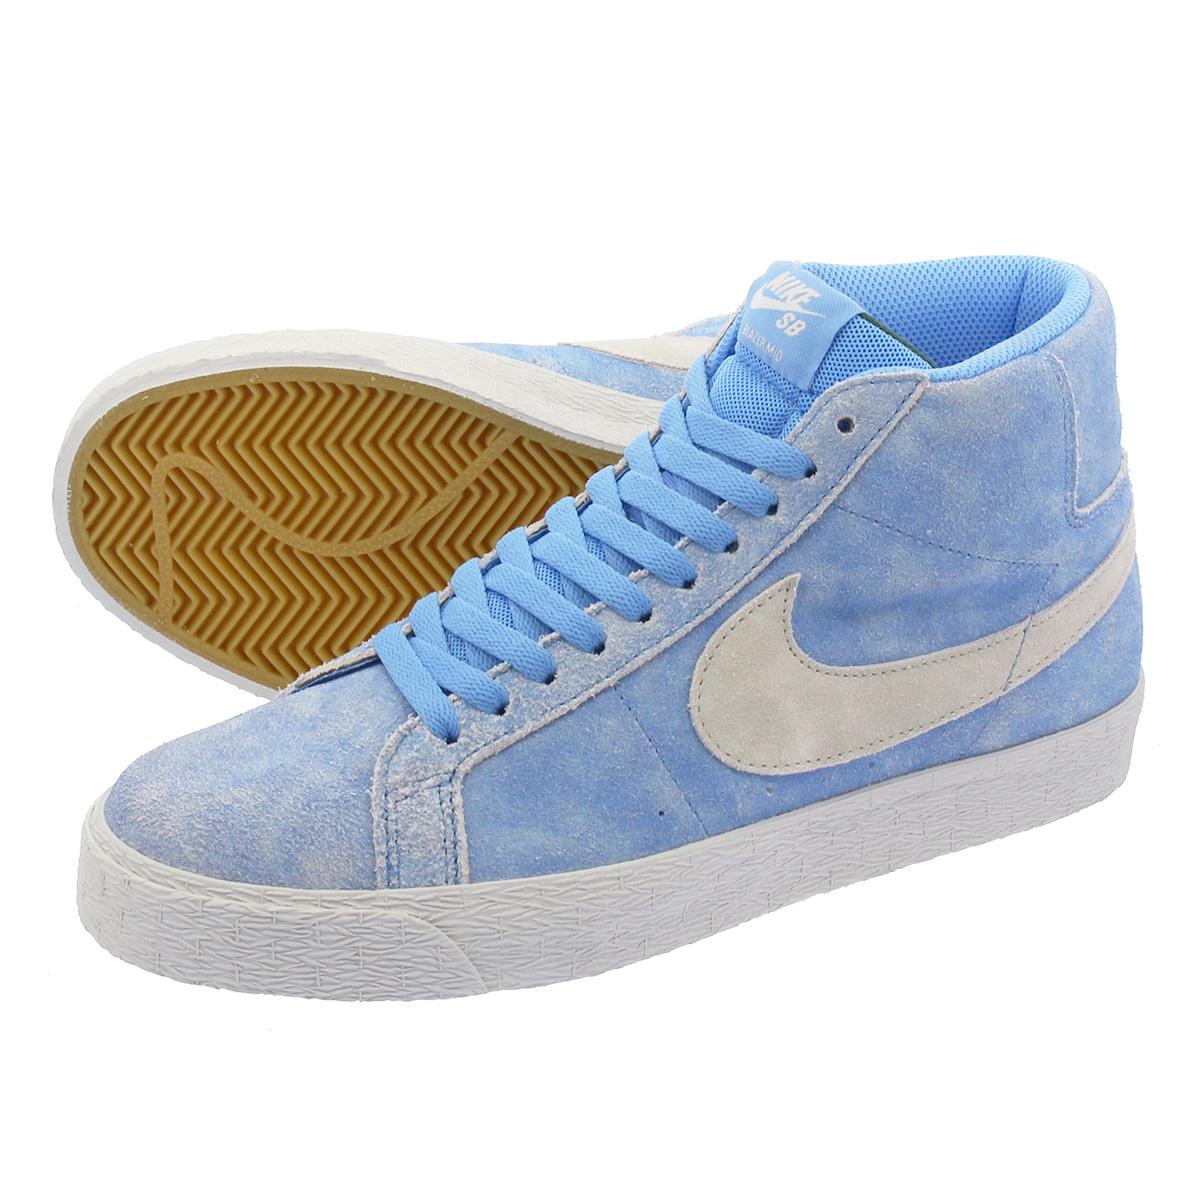 4a0f6741ddaeb NIKE SB BLAZER ZOOM MID Nike SB blazer zoom mid UNIVERSITY BLUE LIGHT BONE  864